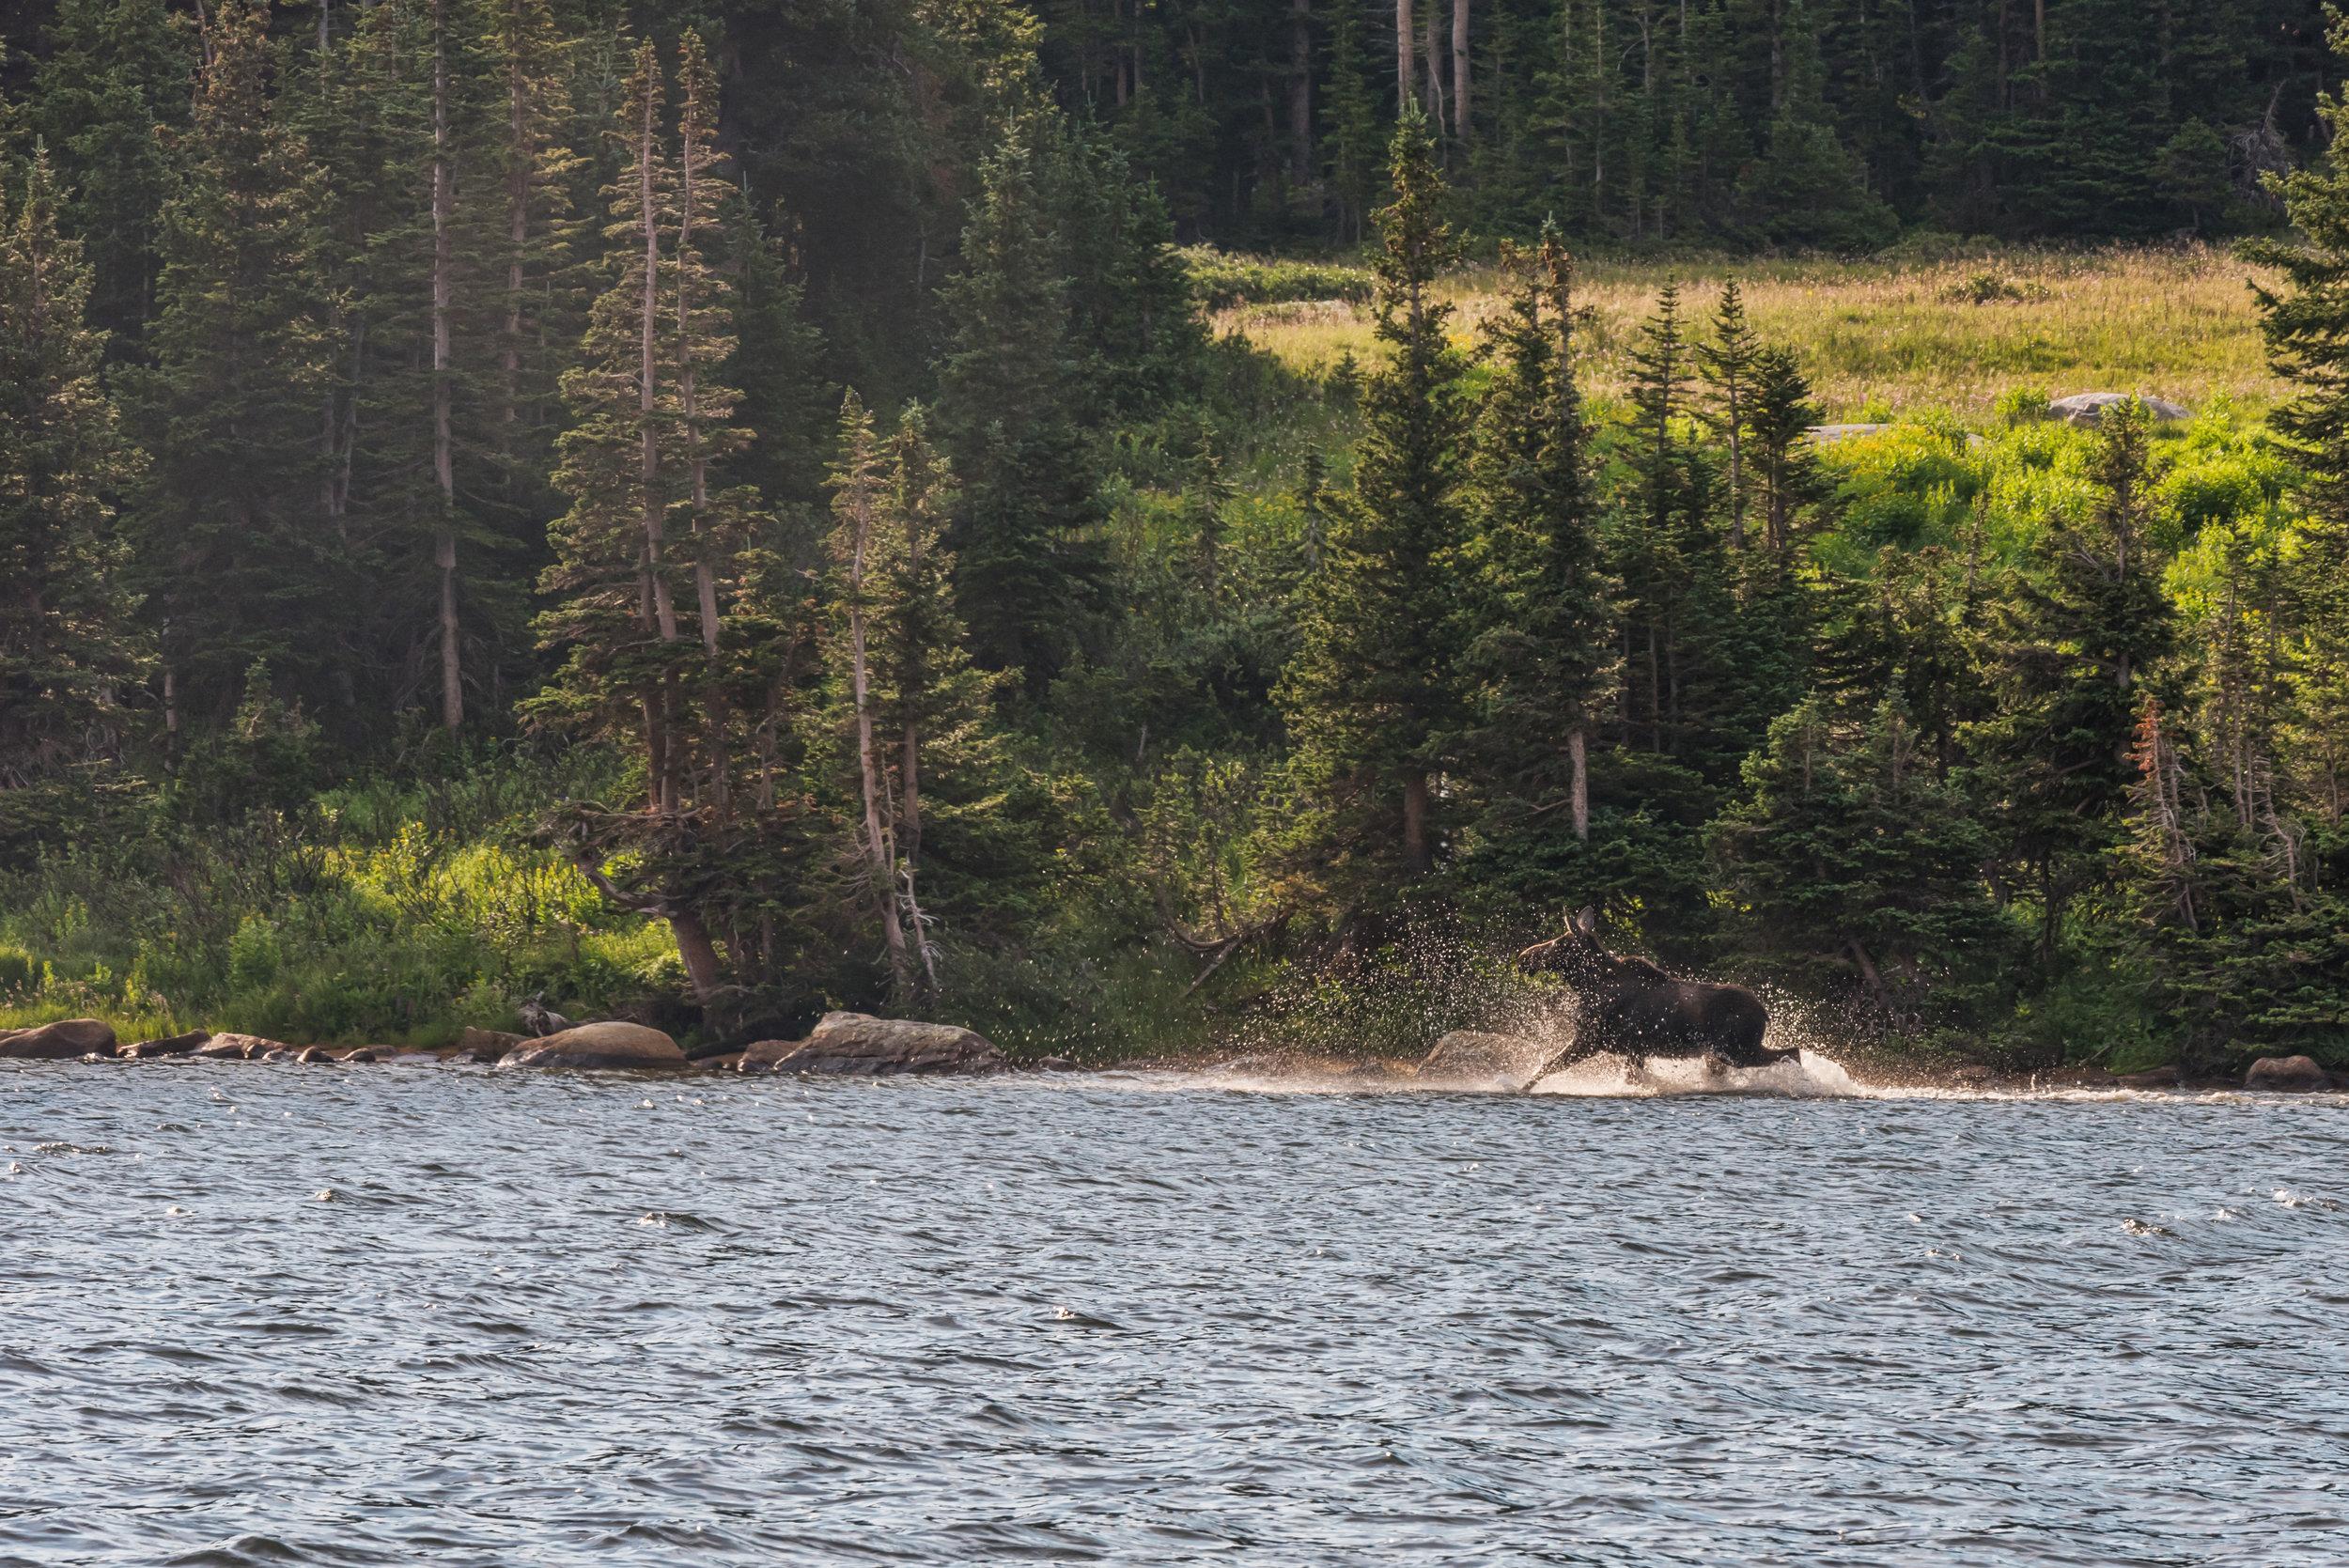 A moose running along the opposite shore of Long Lake.